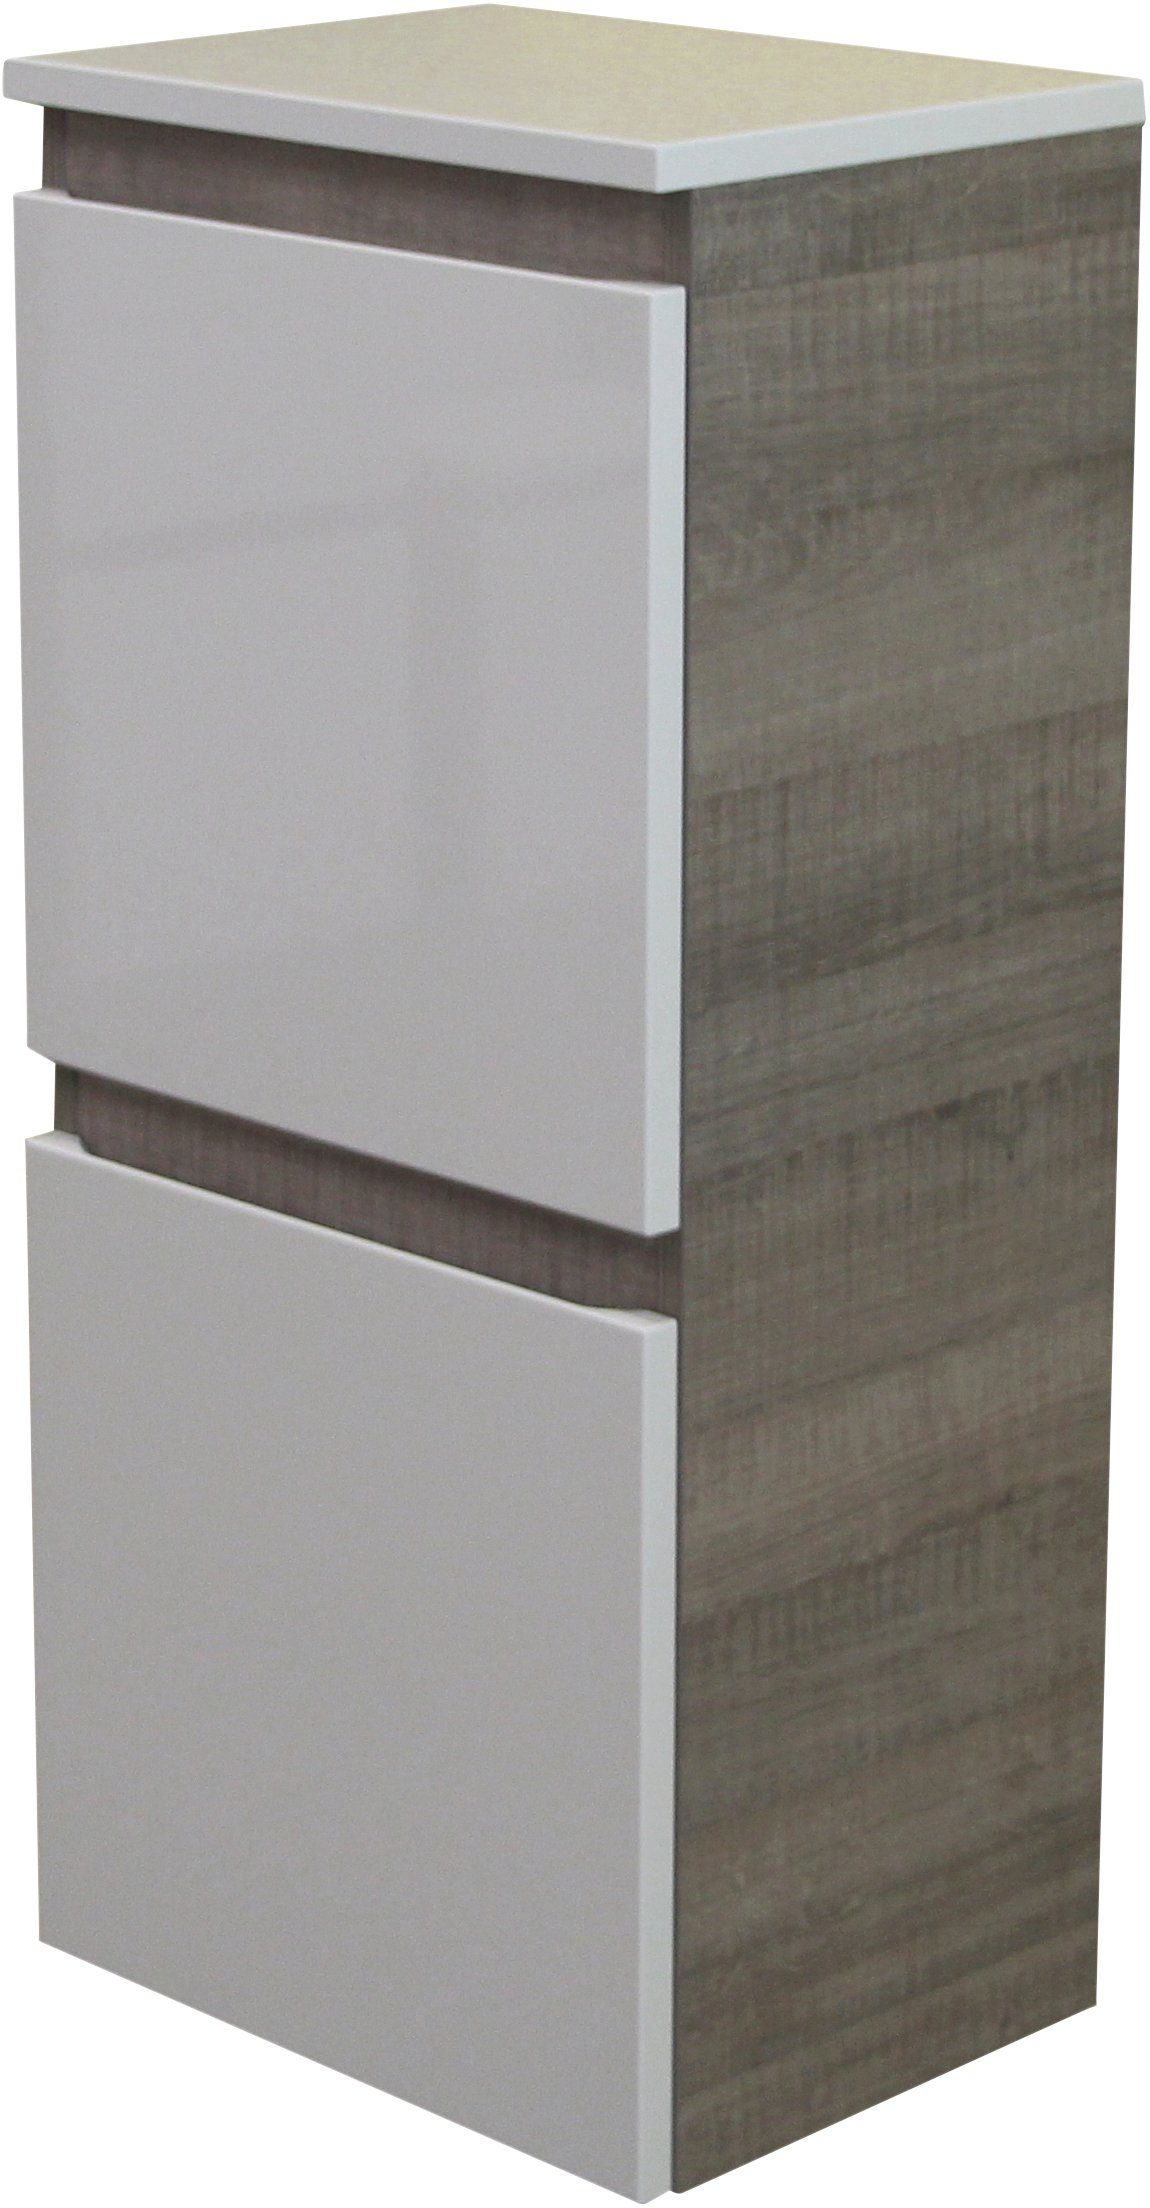 Midischrank »Piuro«, Breite 40,5 cm